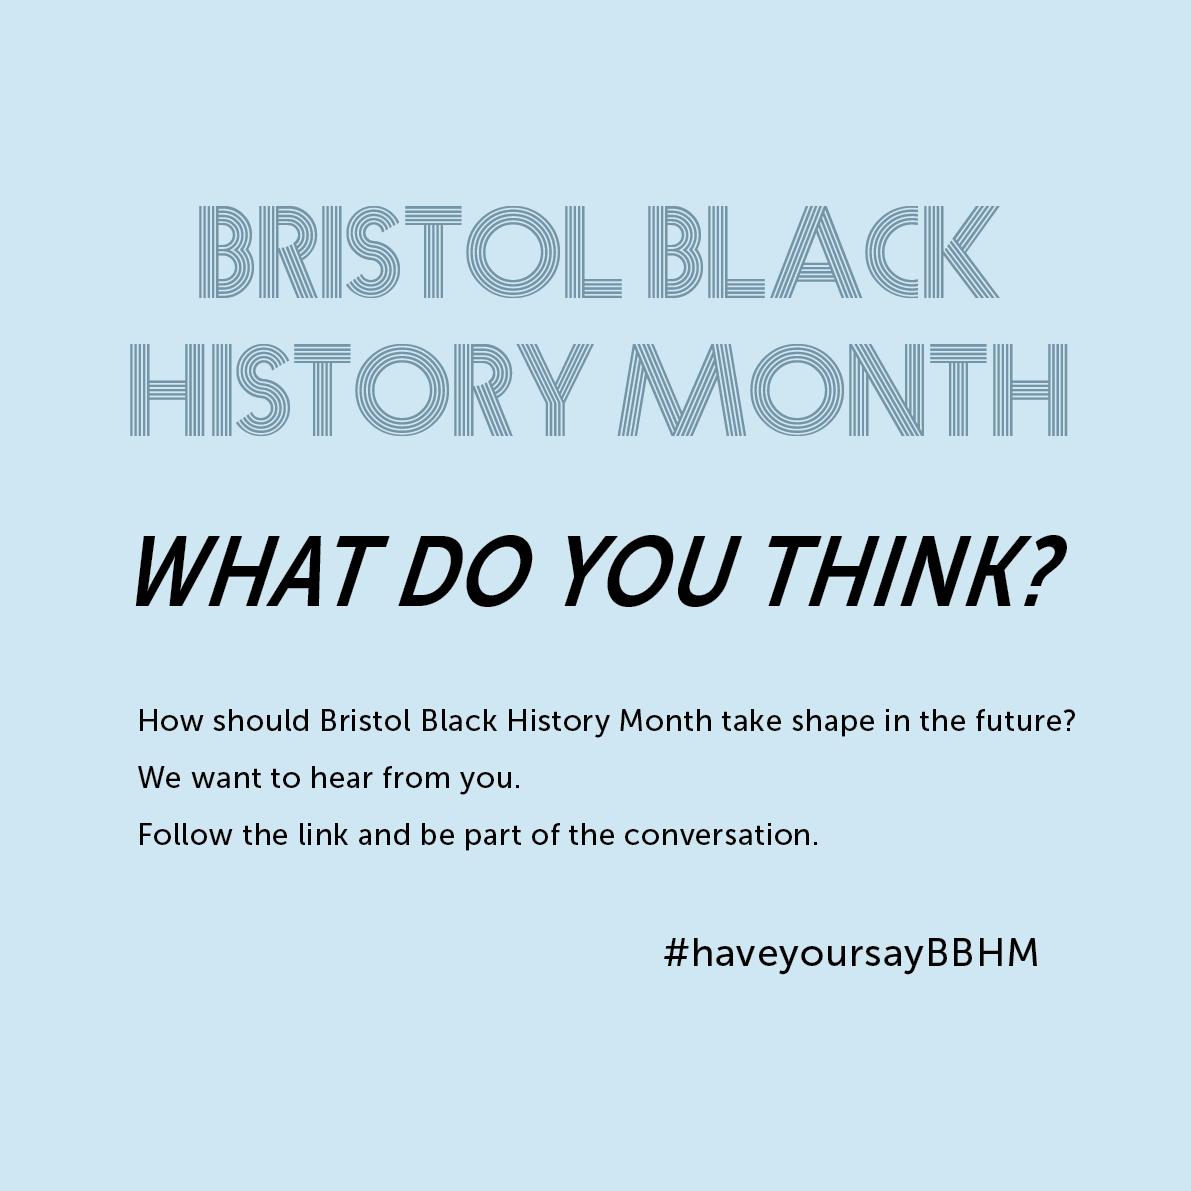 Bristol Black History Month new